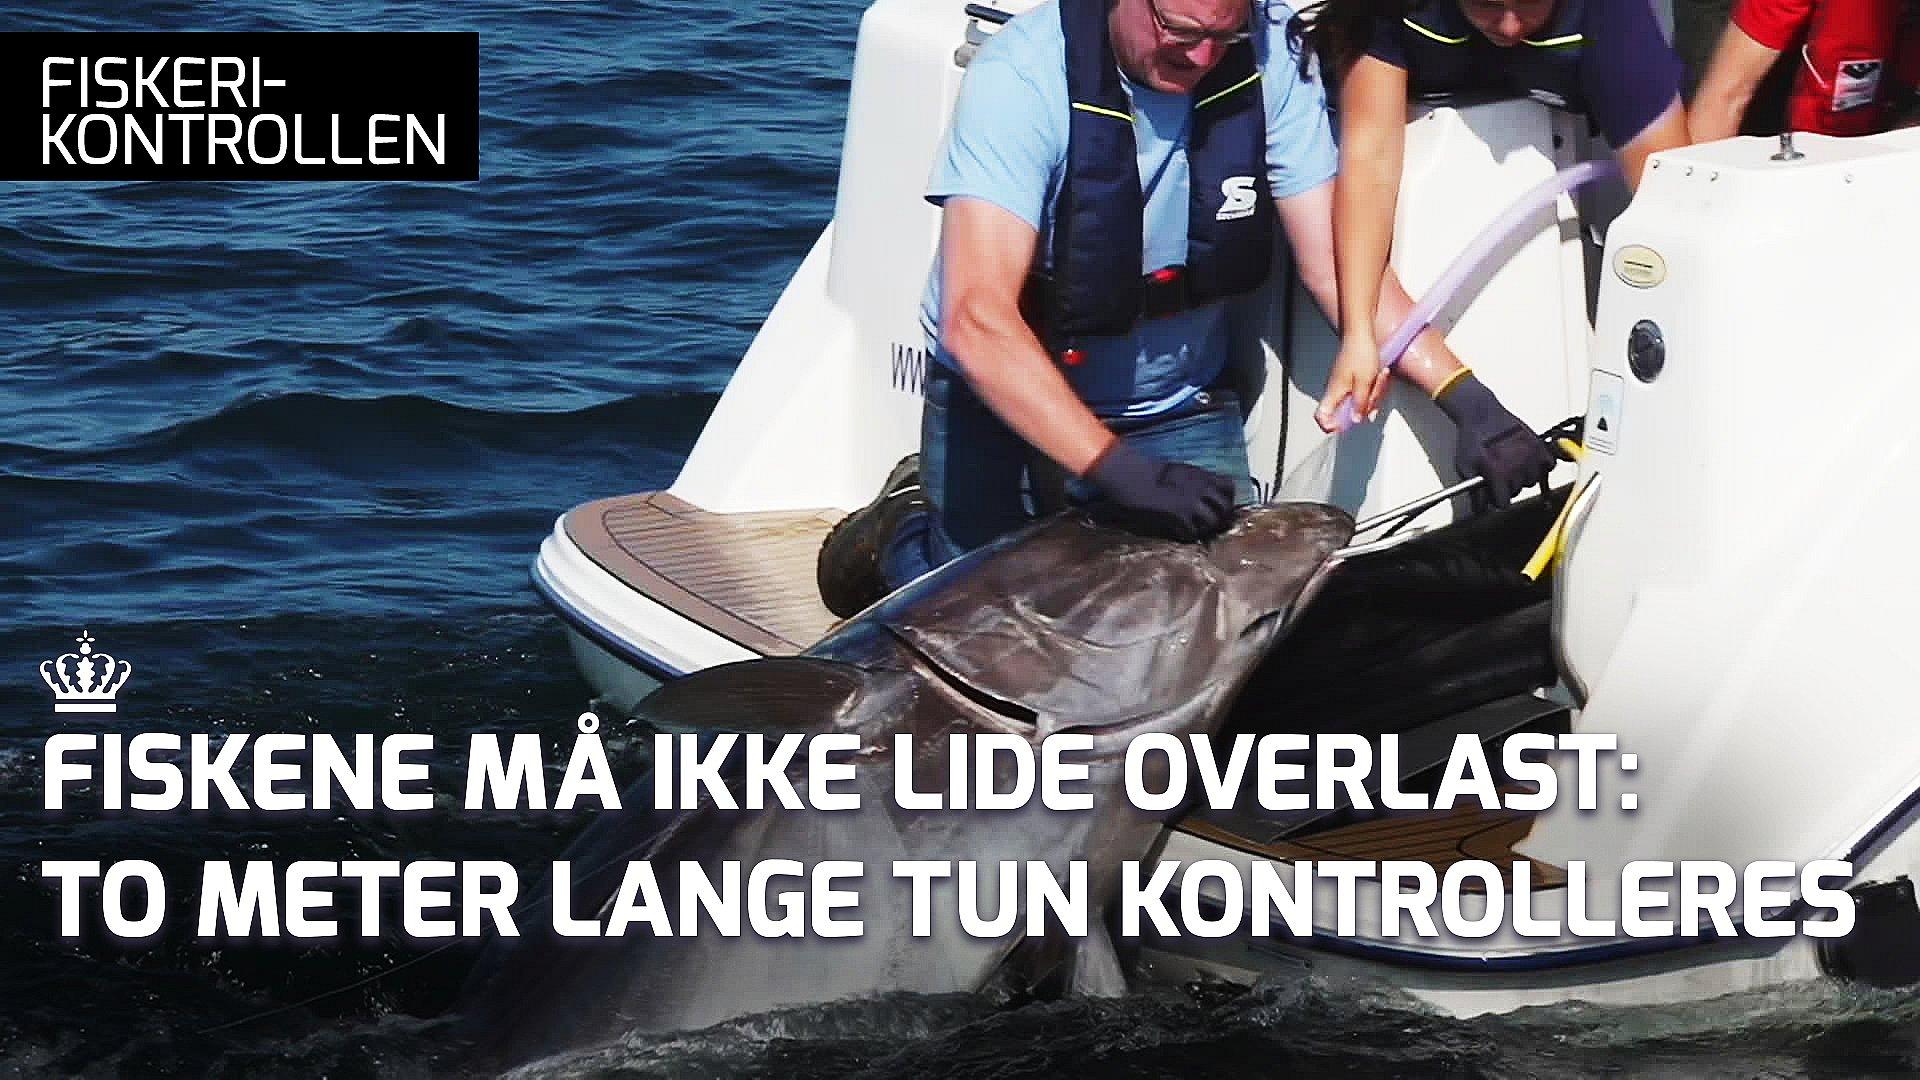 fiskerikontrollen afsnit 2